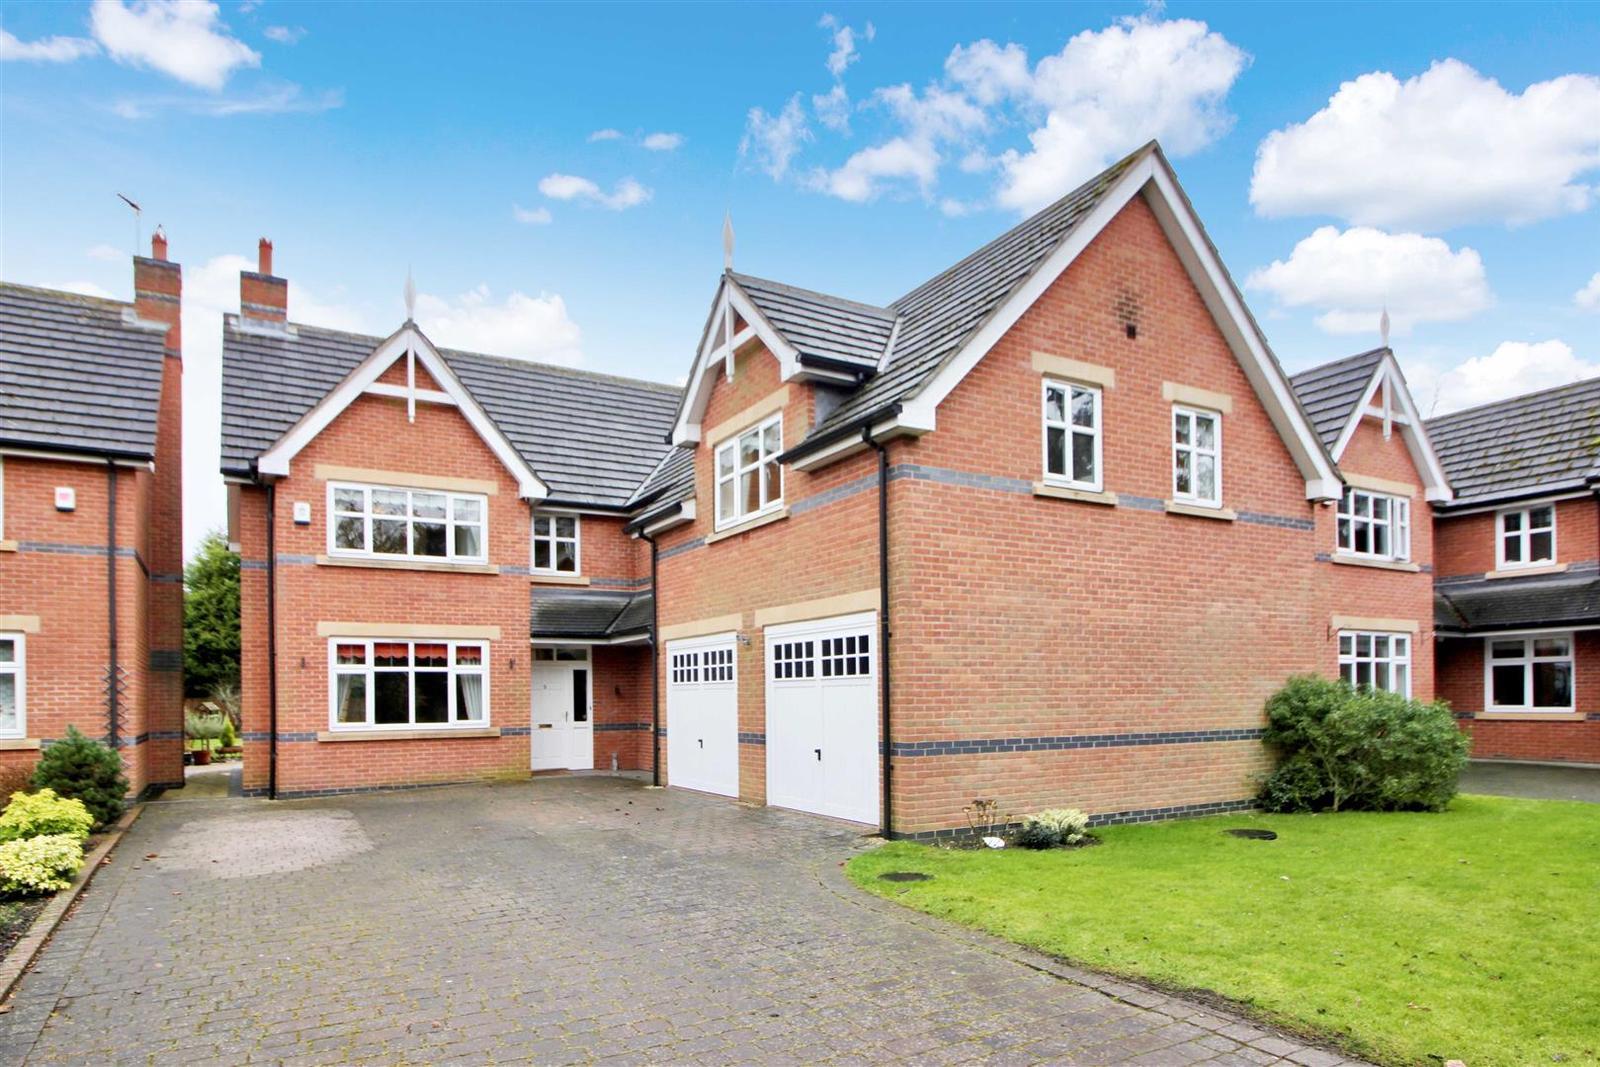 5 Bedrooms Property for sale in Mount Vernon Park, Retford